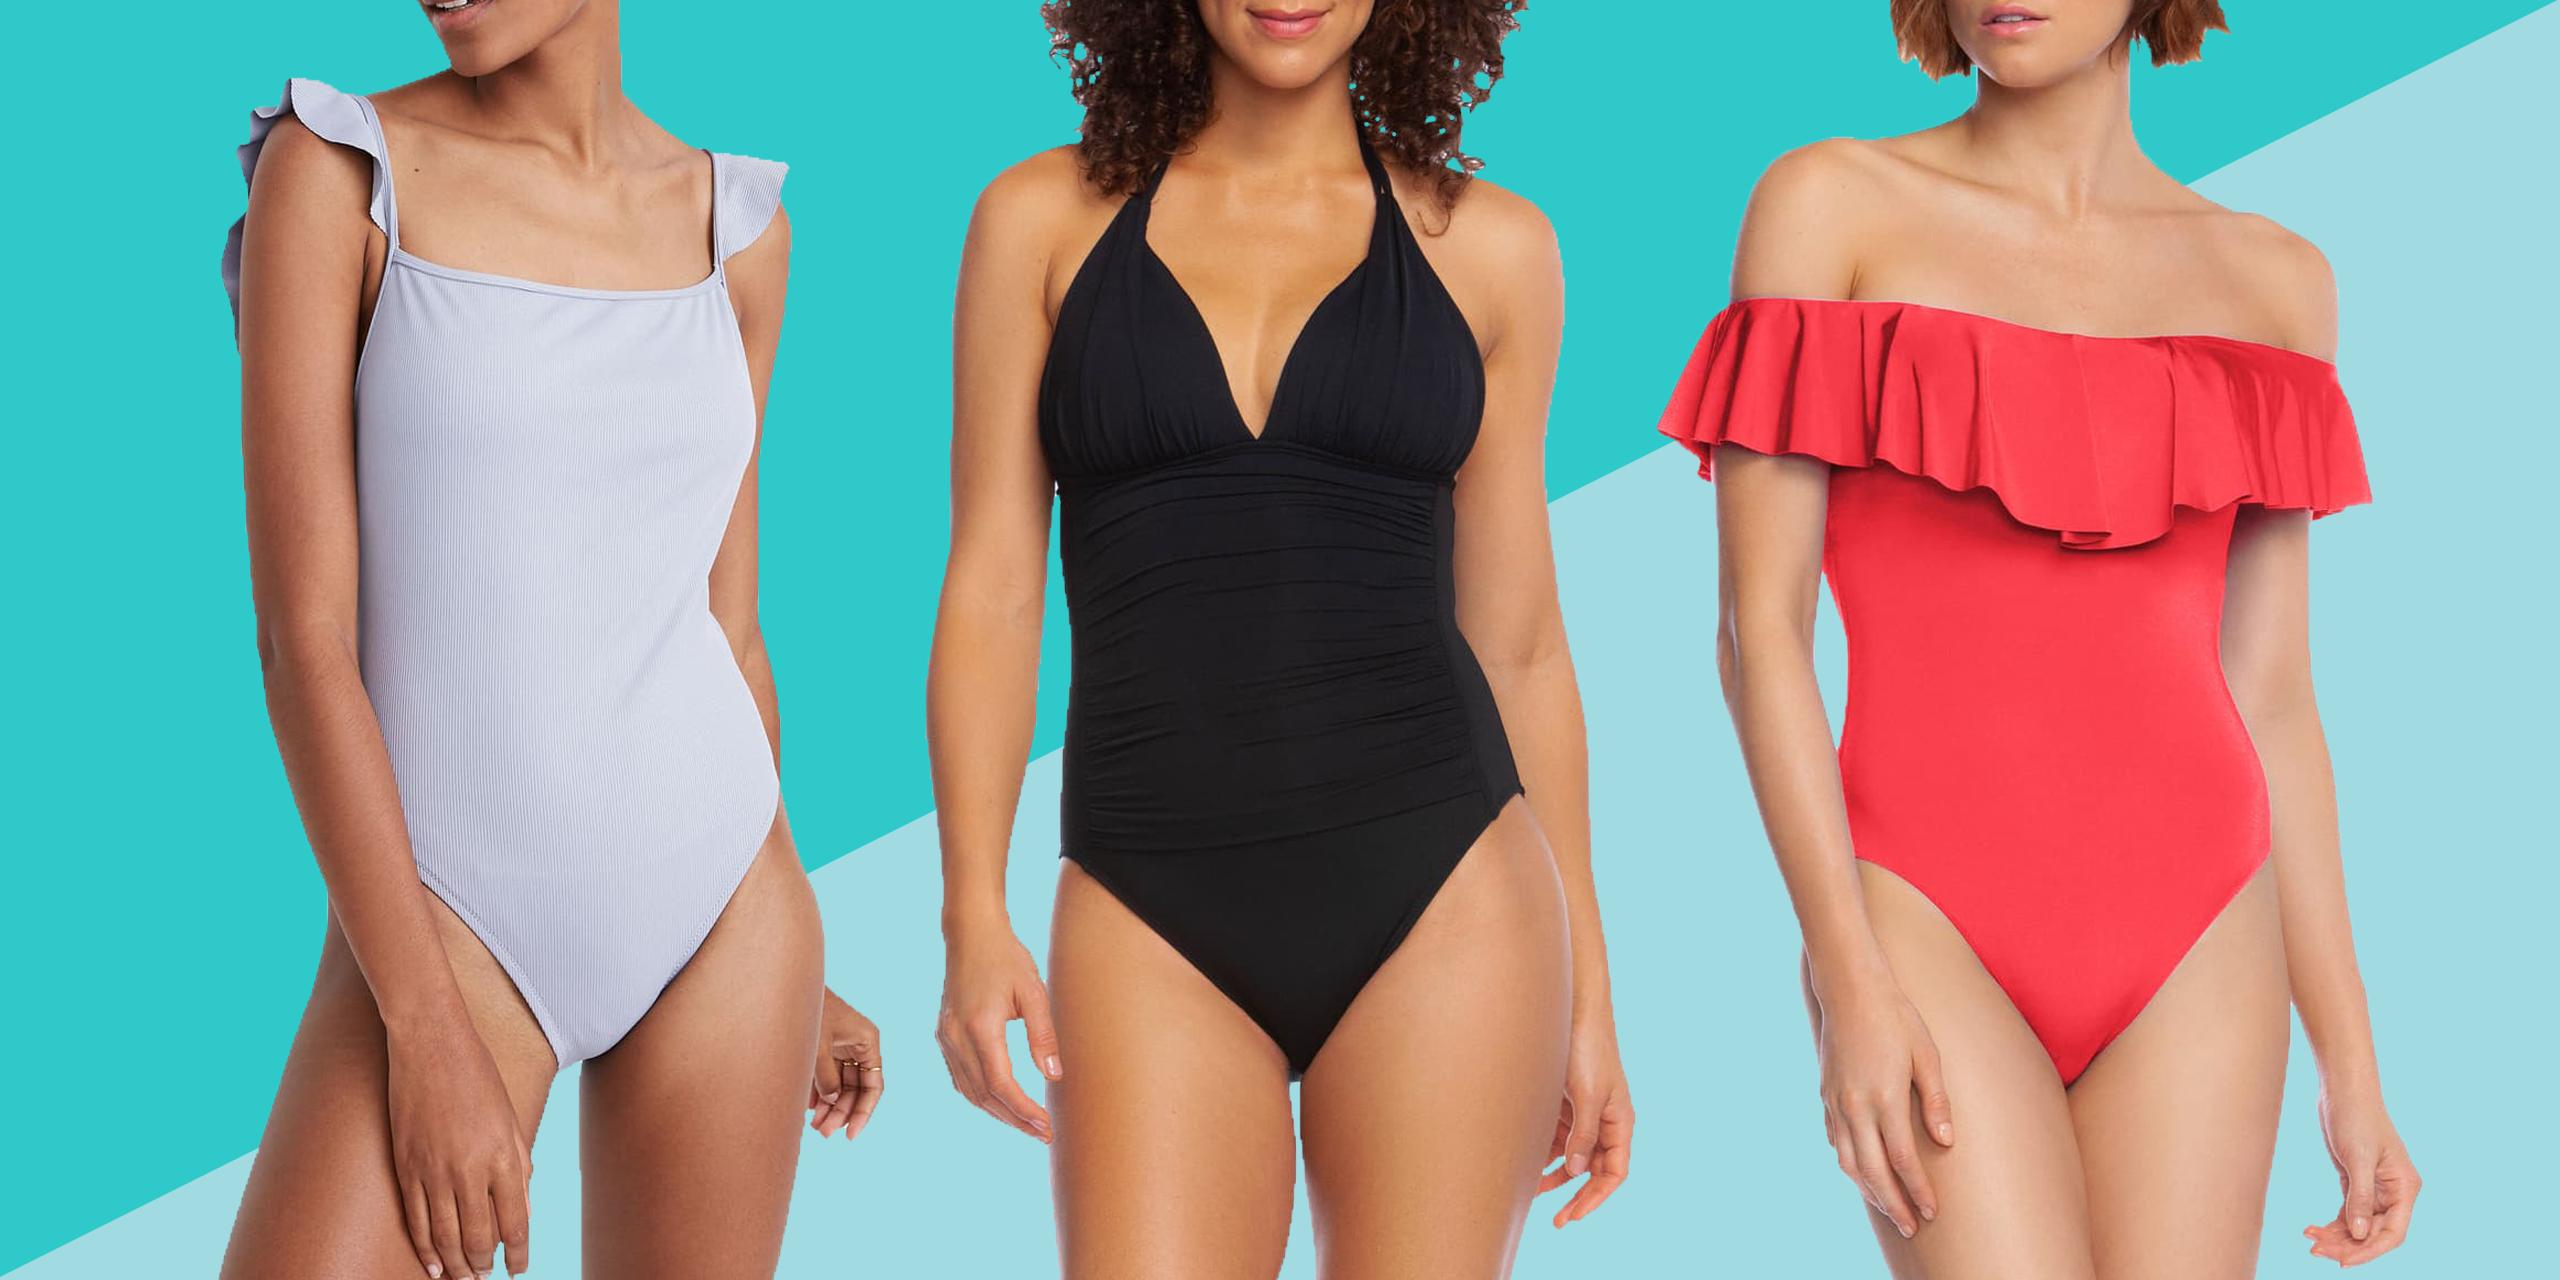 adidas swimming costume amazon